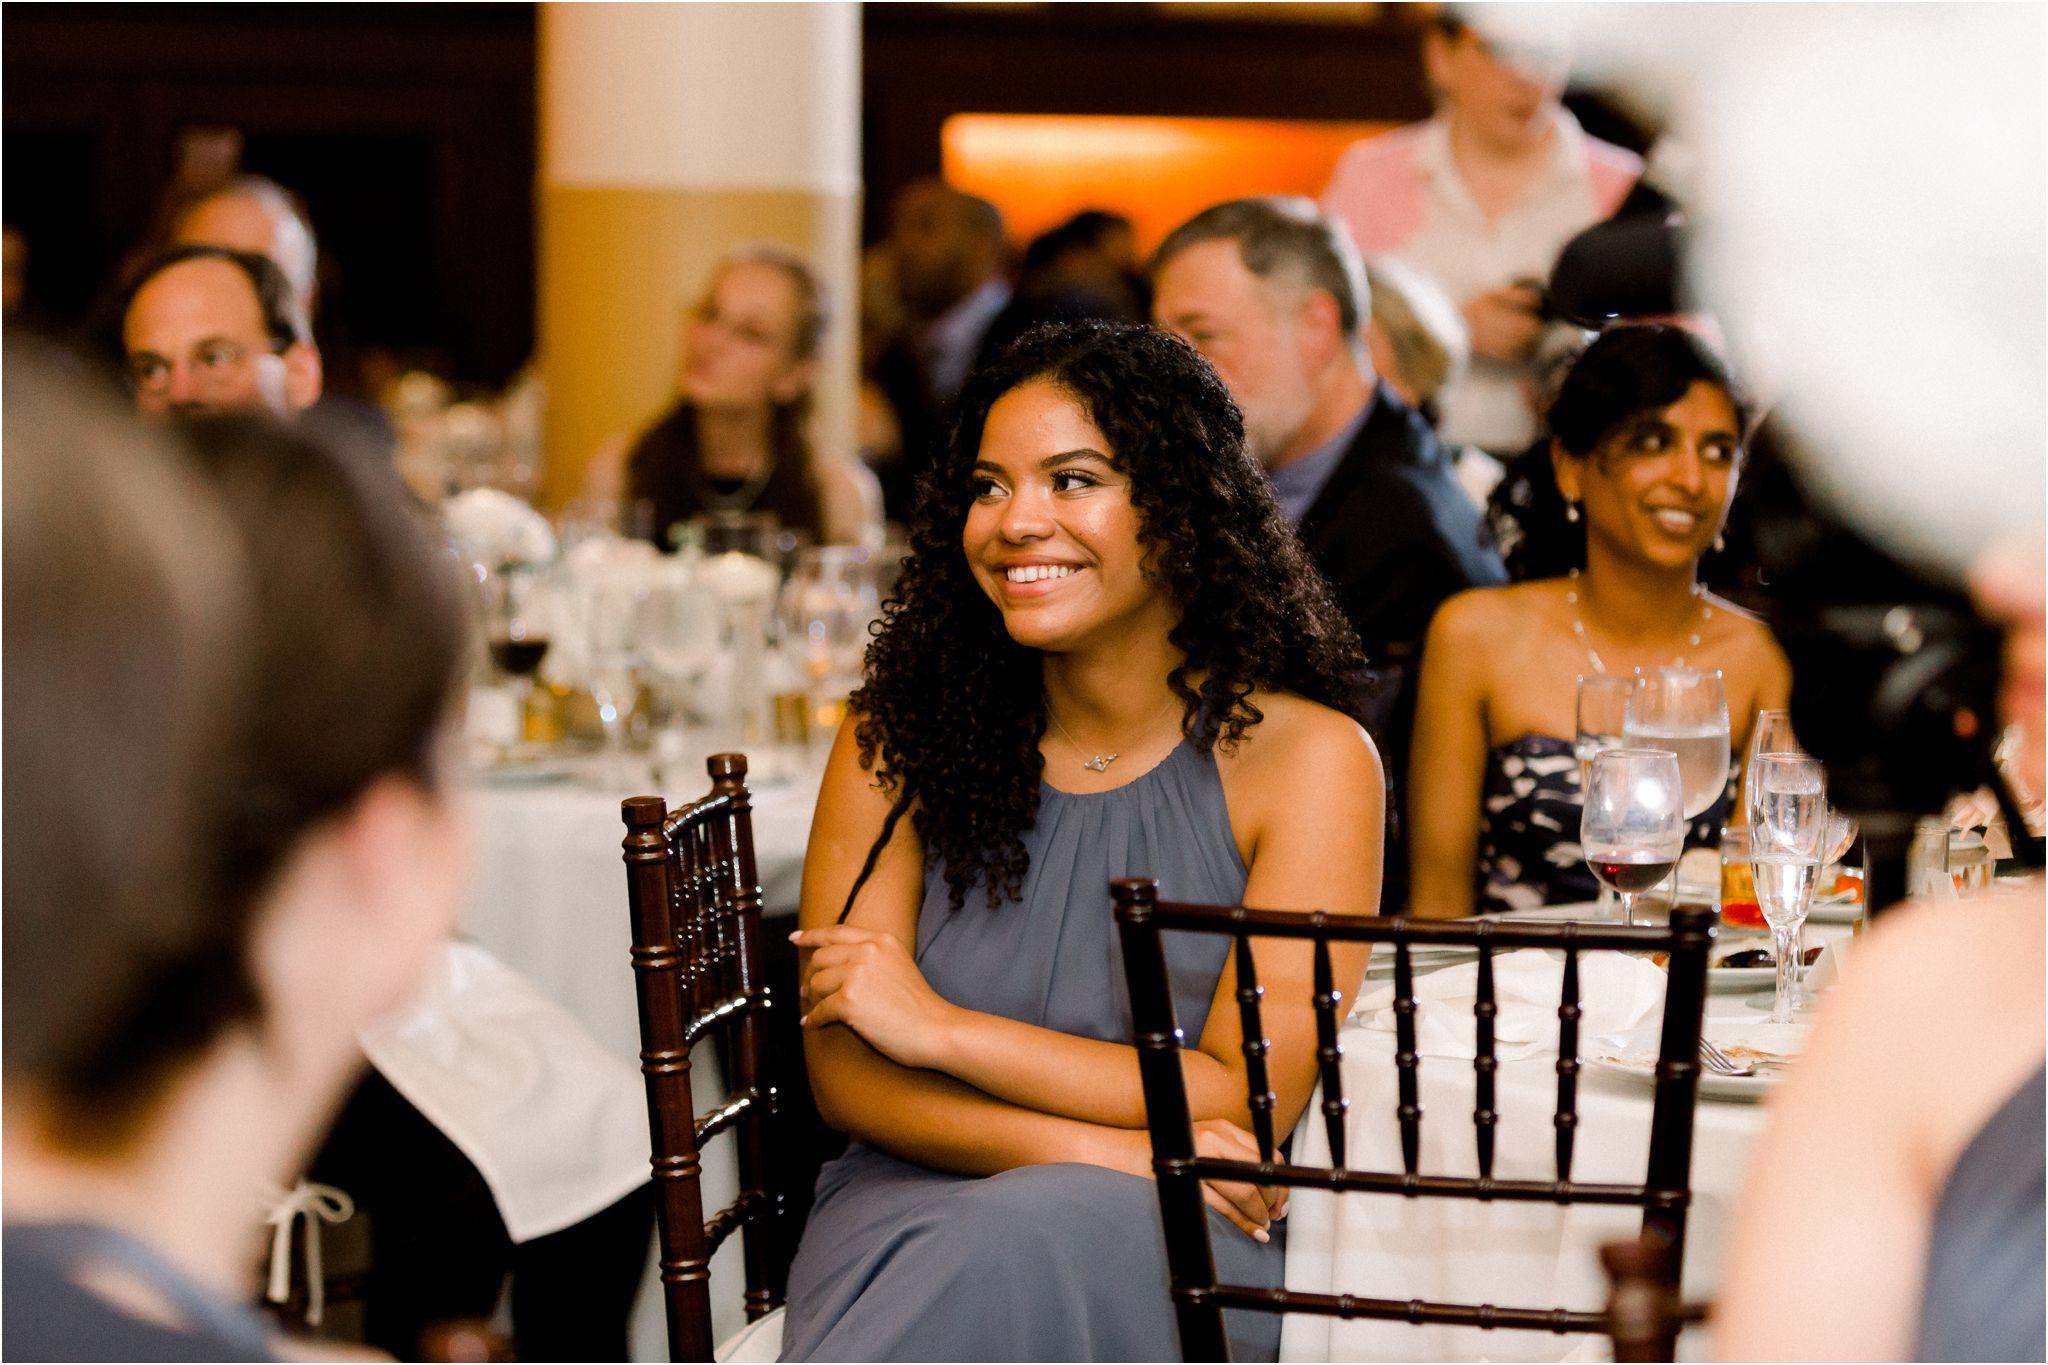 providence-public-library-wedding-images_00046.JPG